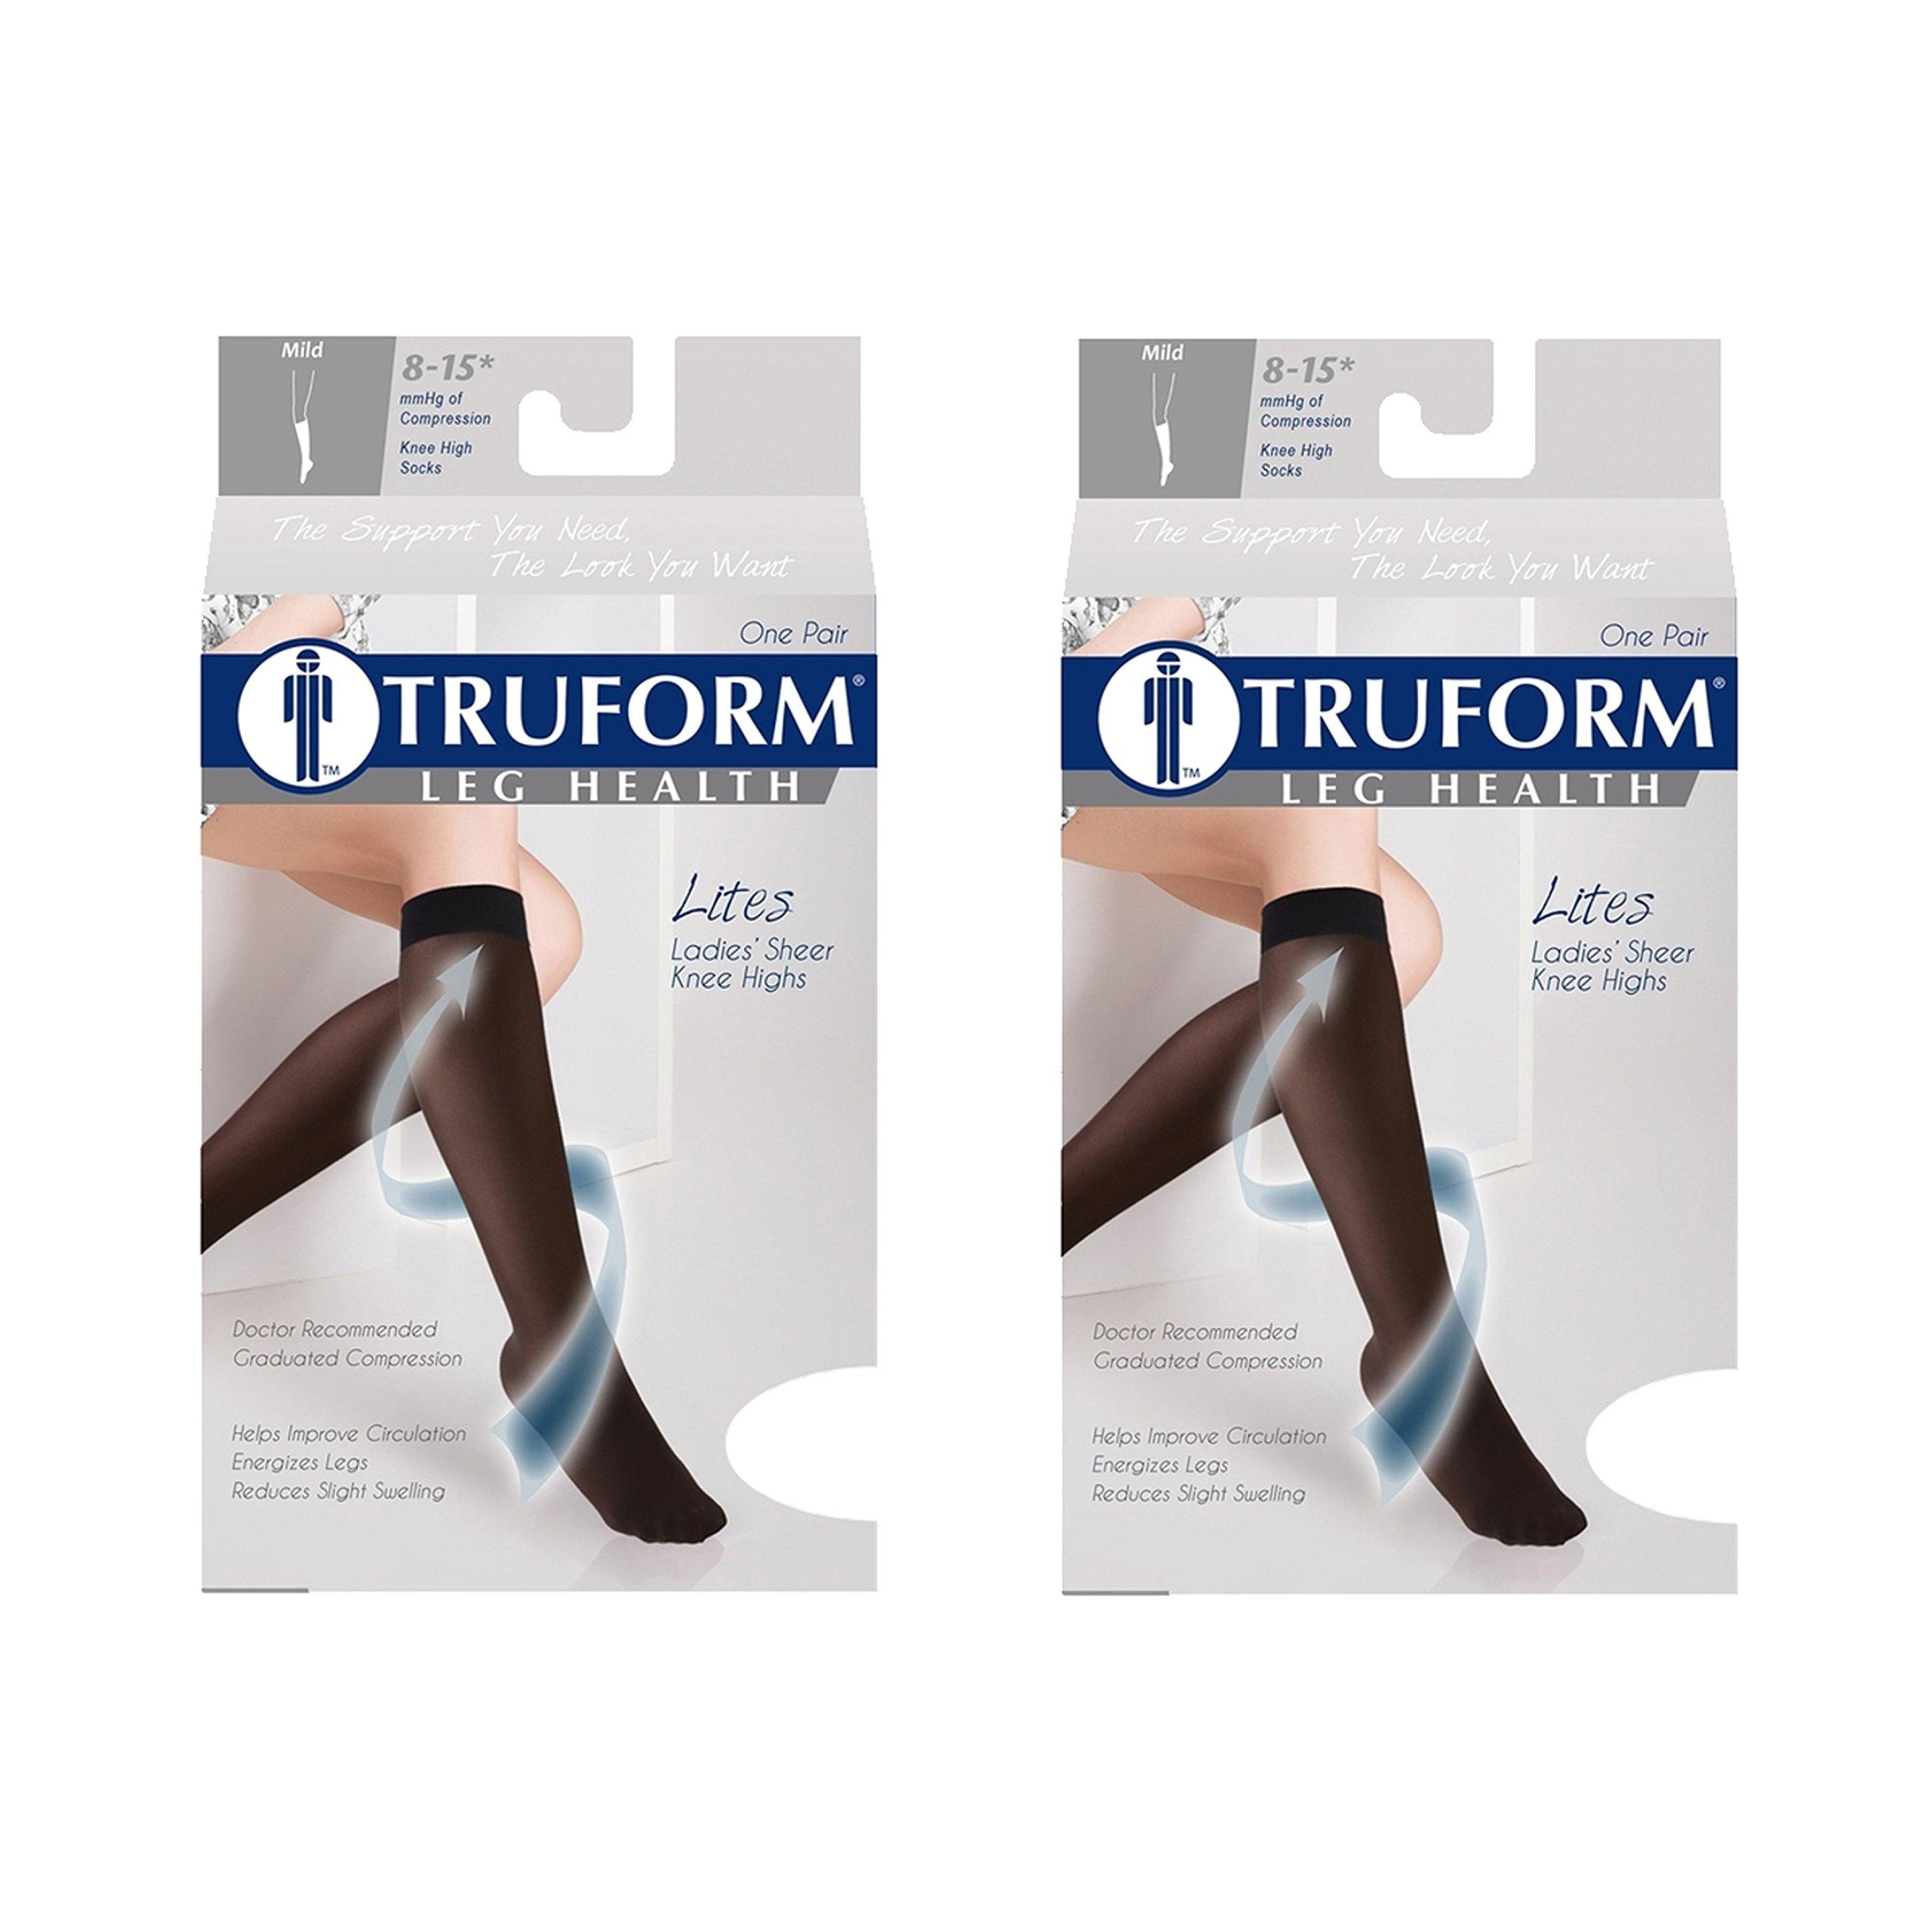 Truform Compression 8-15 mmHg Sheer Knee High Stockings Beige, Medium, 2 Count